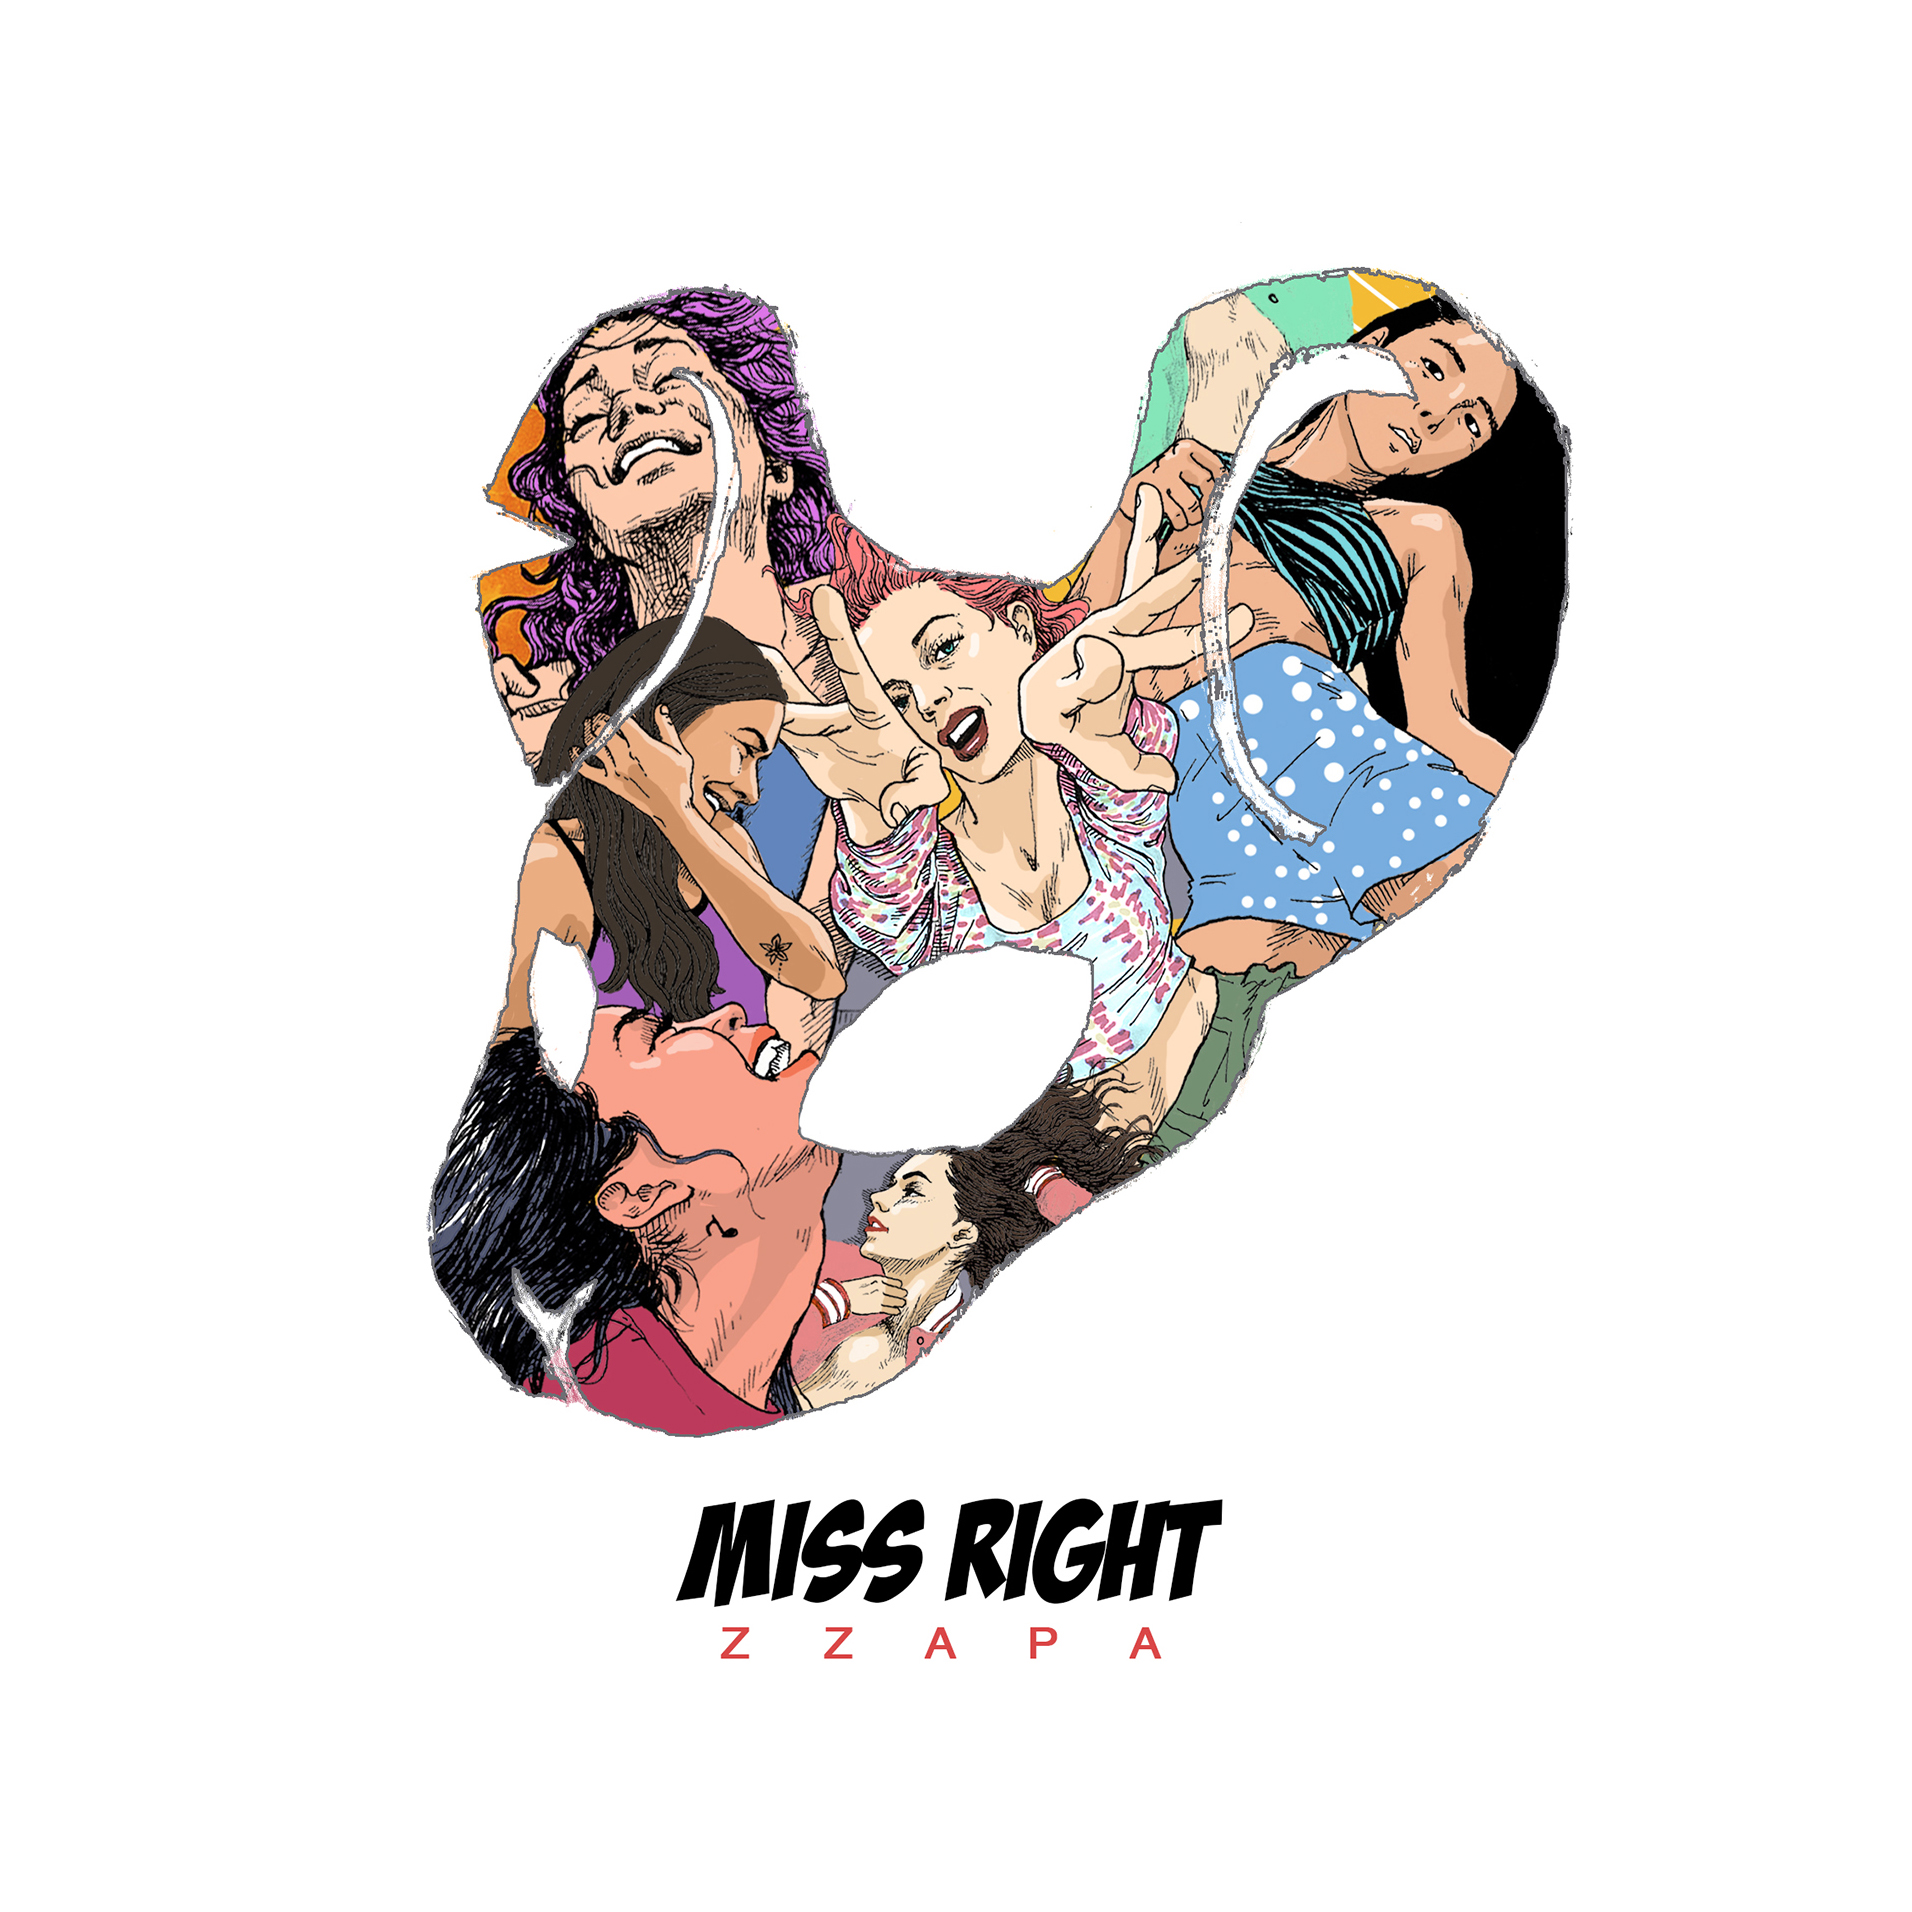 missright_cover_final.jpg